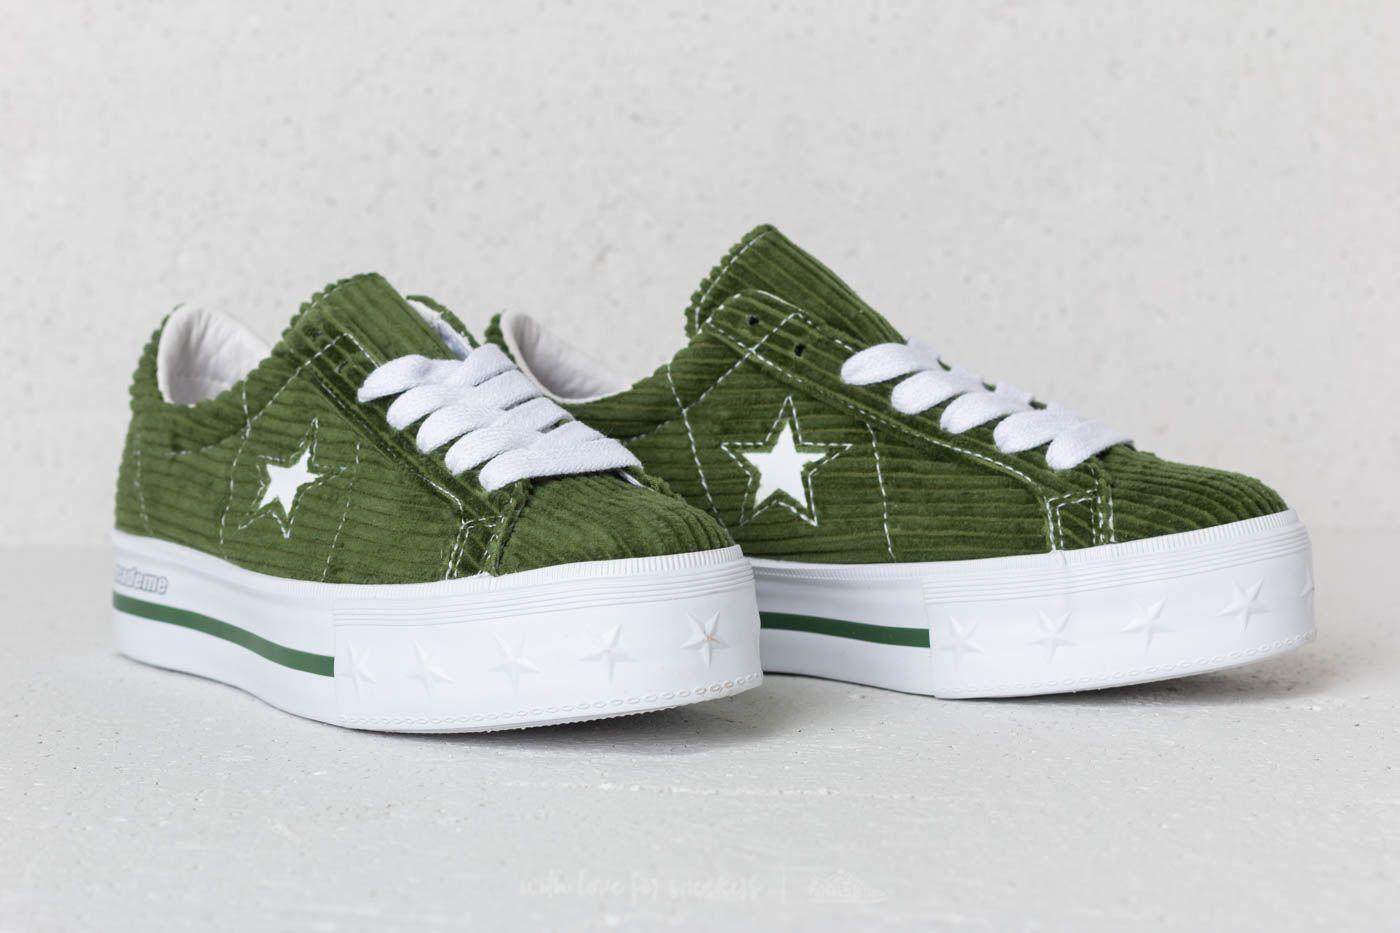 249f4c6dcb3881 converse mademe one star platform. Converse x Mademe One Star Platform OX  Garden Green